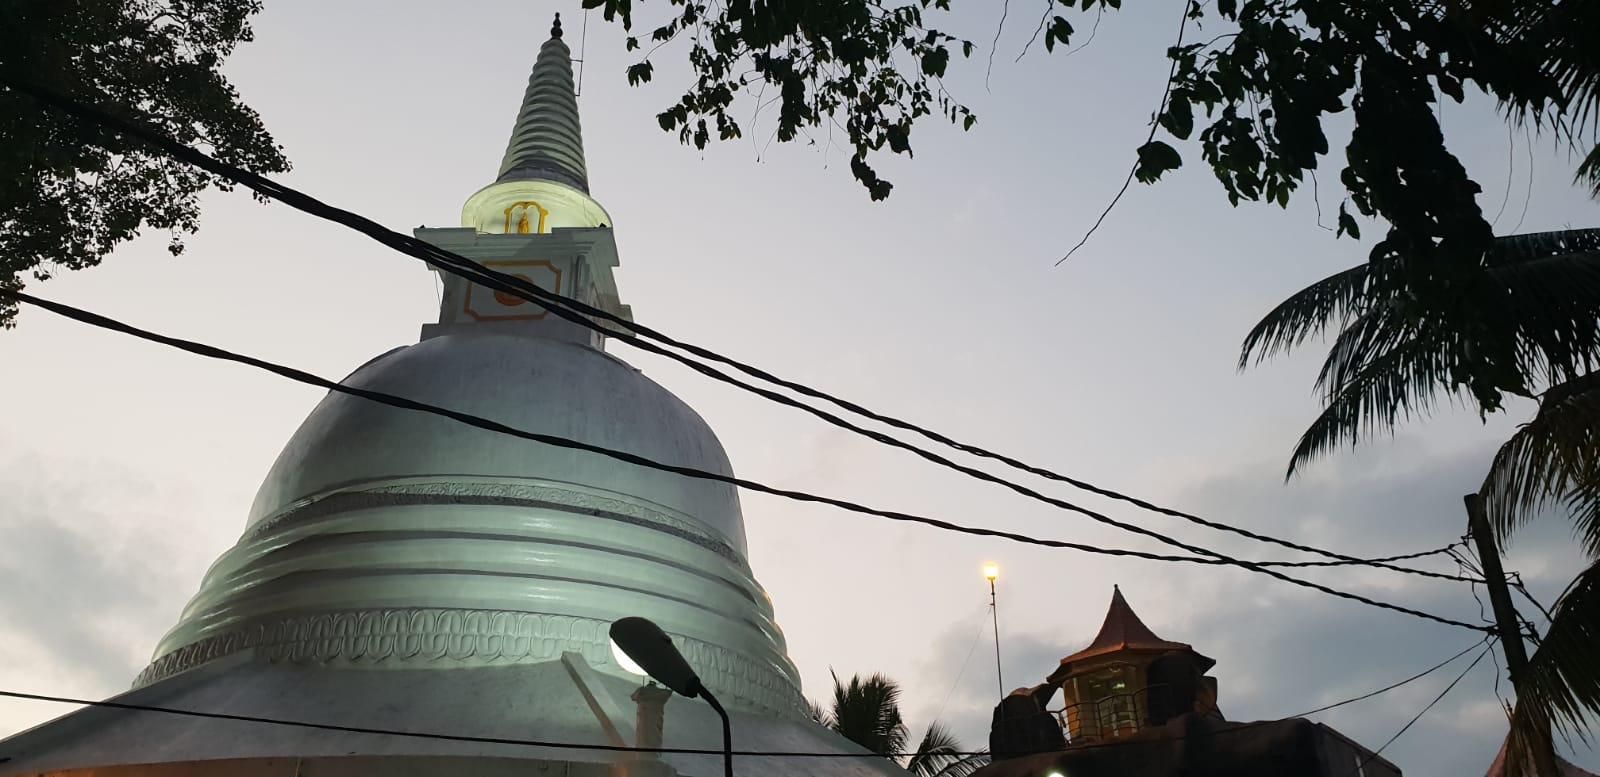 sri lanka authentique stupa bouddhiste